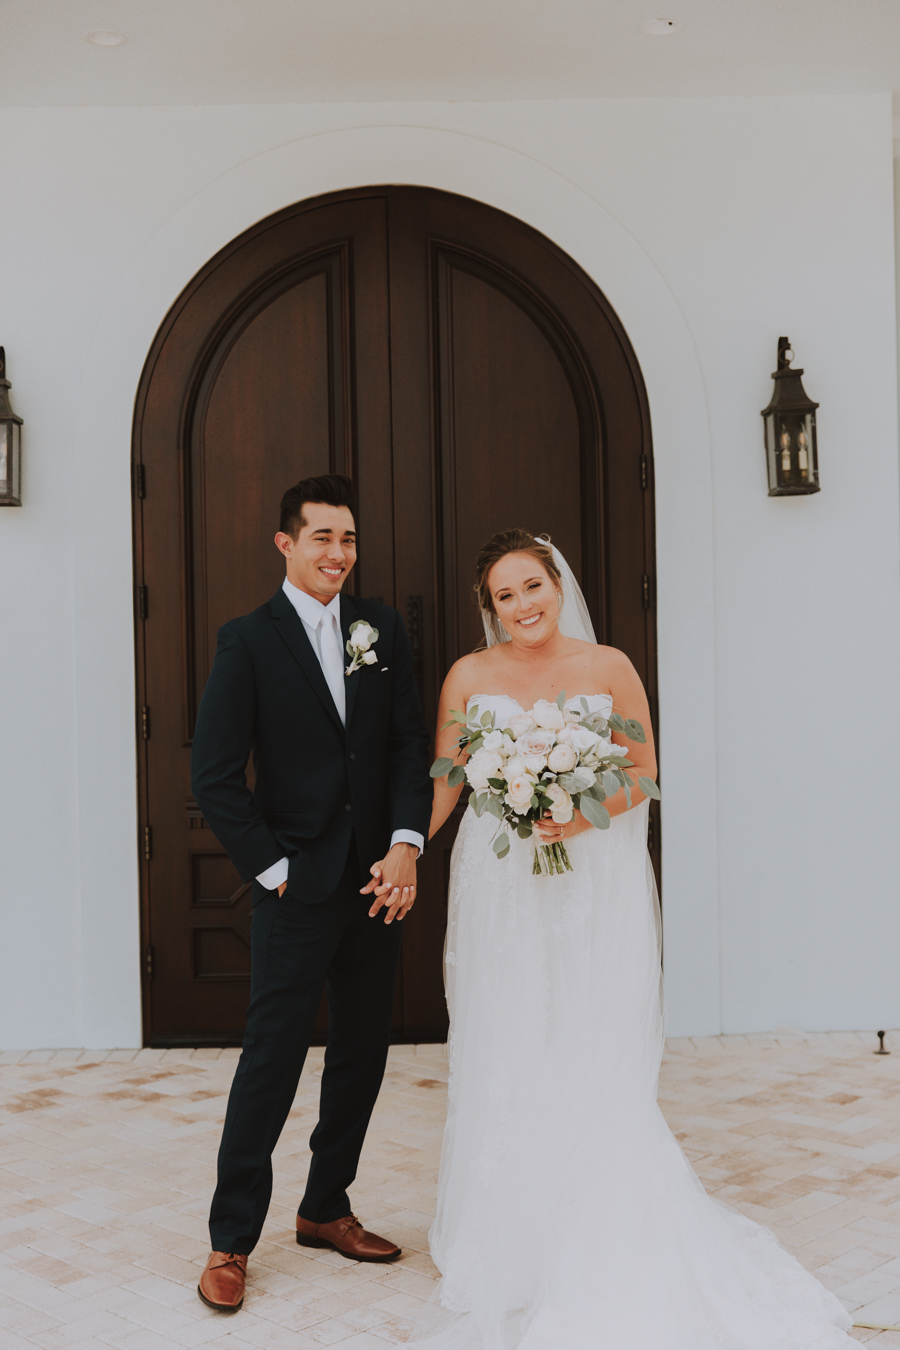 Harborside Chapel Wedding Clearwater Affordable Tampa Venues BHLDN Palm Harbor Safety Harbor Resort and Spa Wedding Malindy Elene Bridal St Pete Wedding Photographer Tampa Wedding Photographer-72.jpg